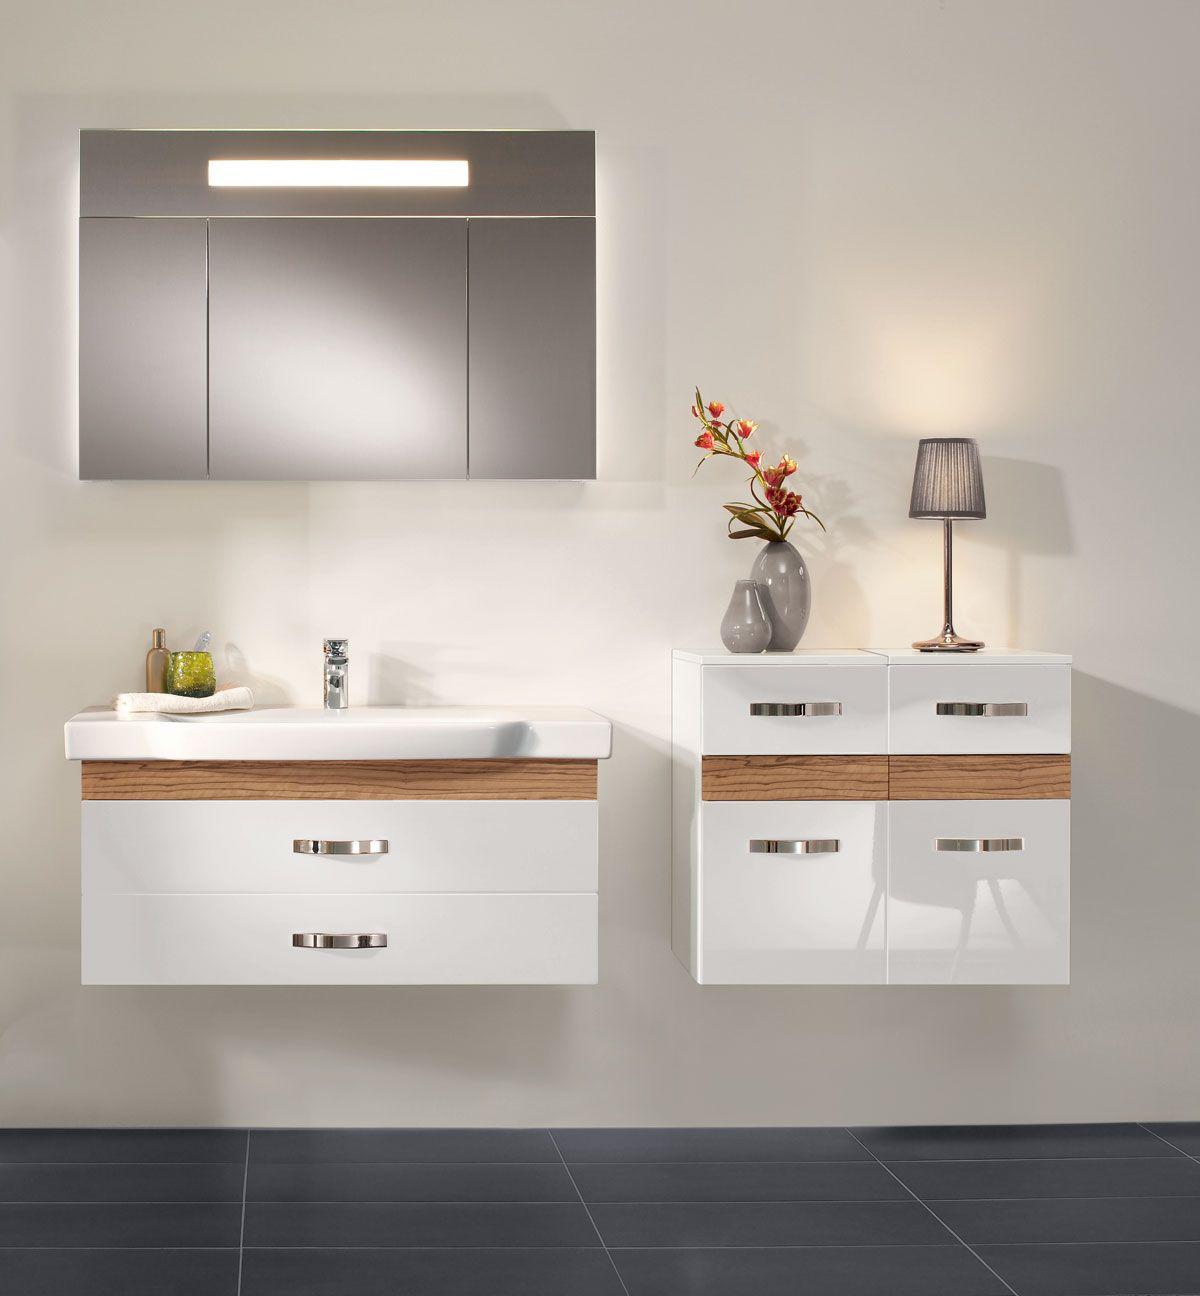 Villeroy & Boch 2morrow Furniture Range - White and Olive | Villeroy ...